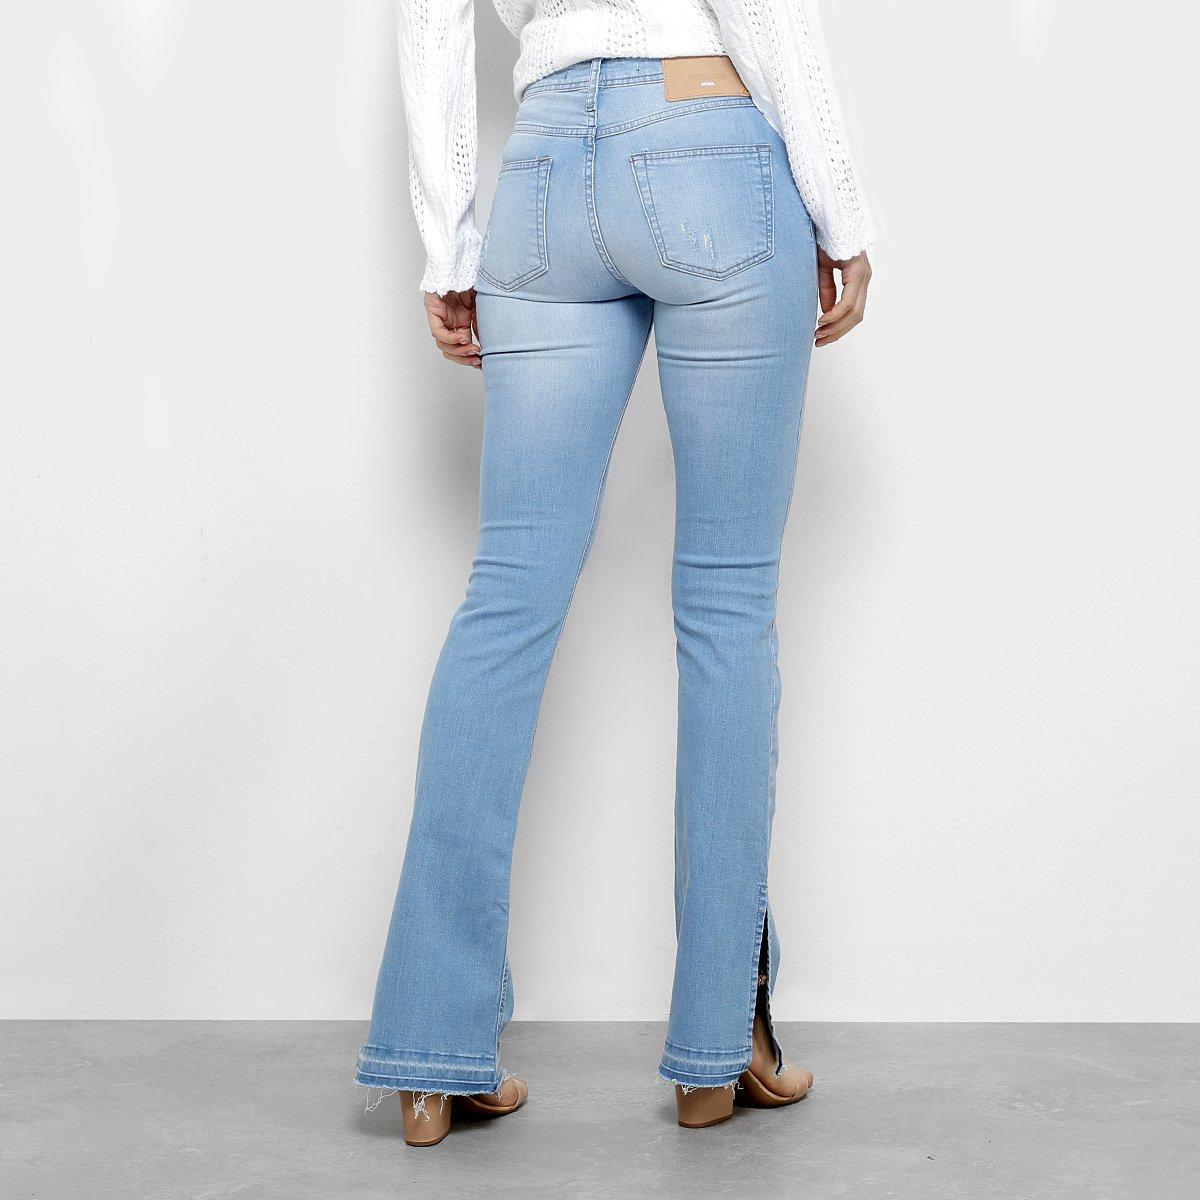 1c89b0006 ... Foto 2 - Calça Jeans Flare Forum Estonada Cintura Média Feminina